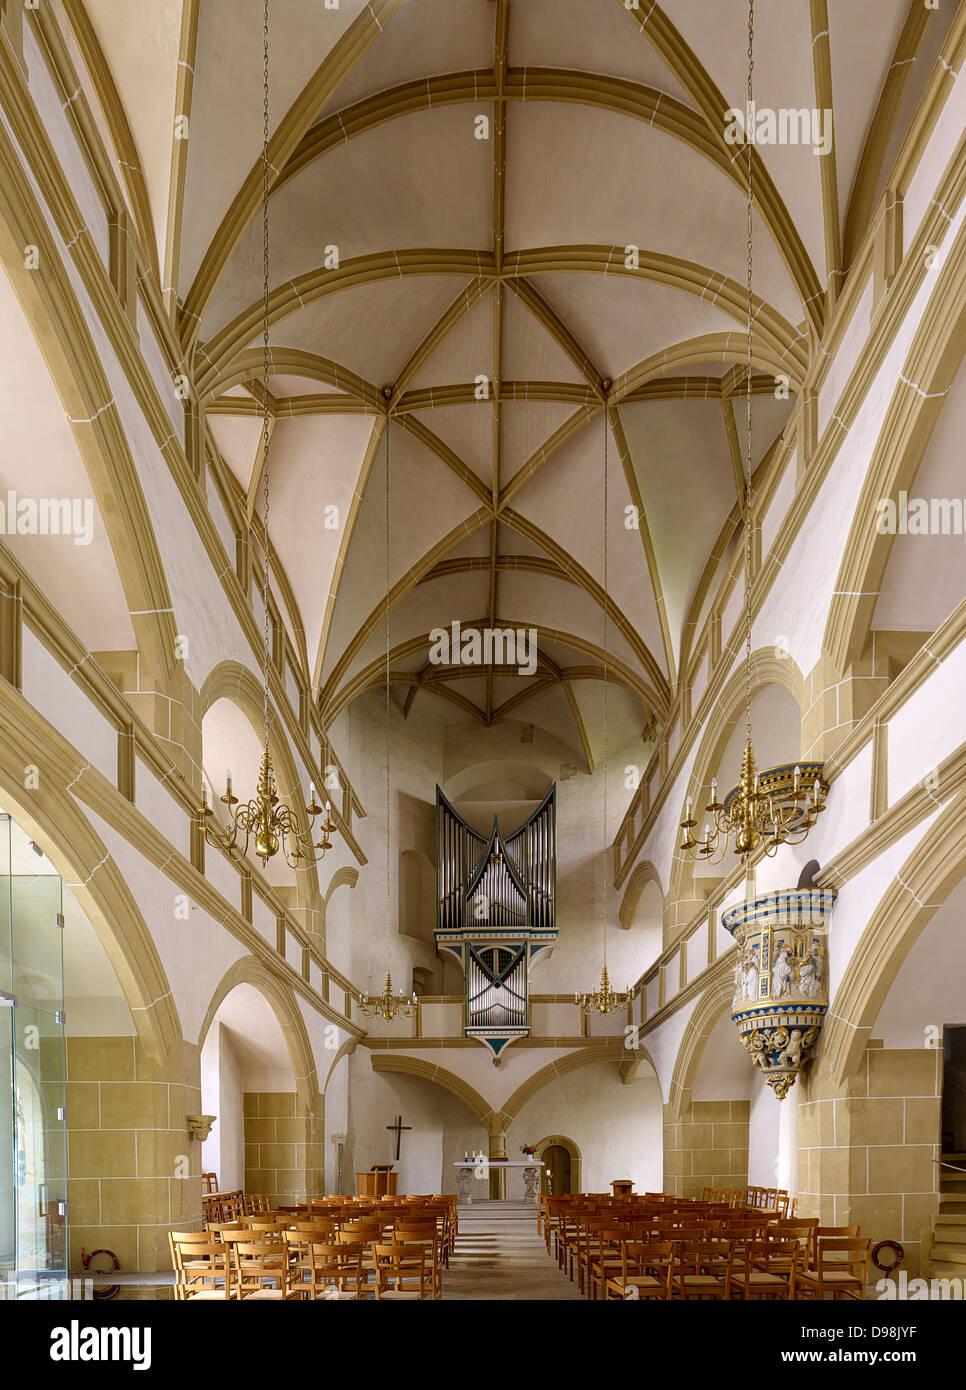 Chapel, Hartenfels Castle, Torgau, Saxony Germany Stock Photo